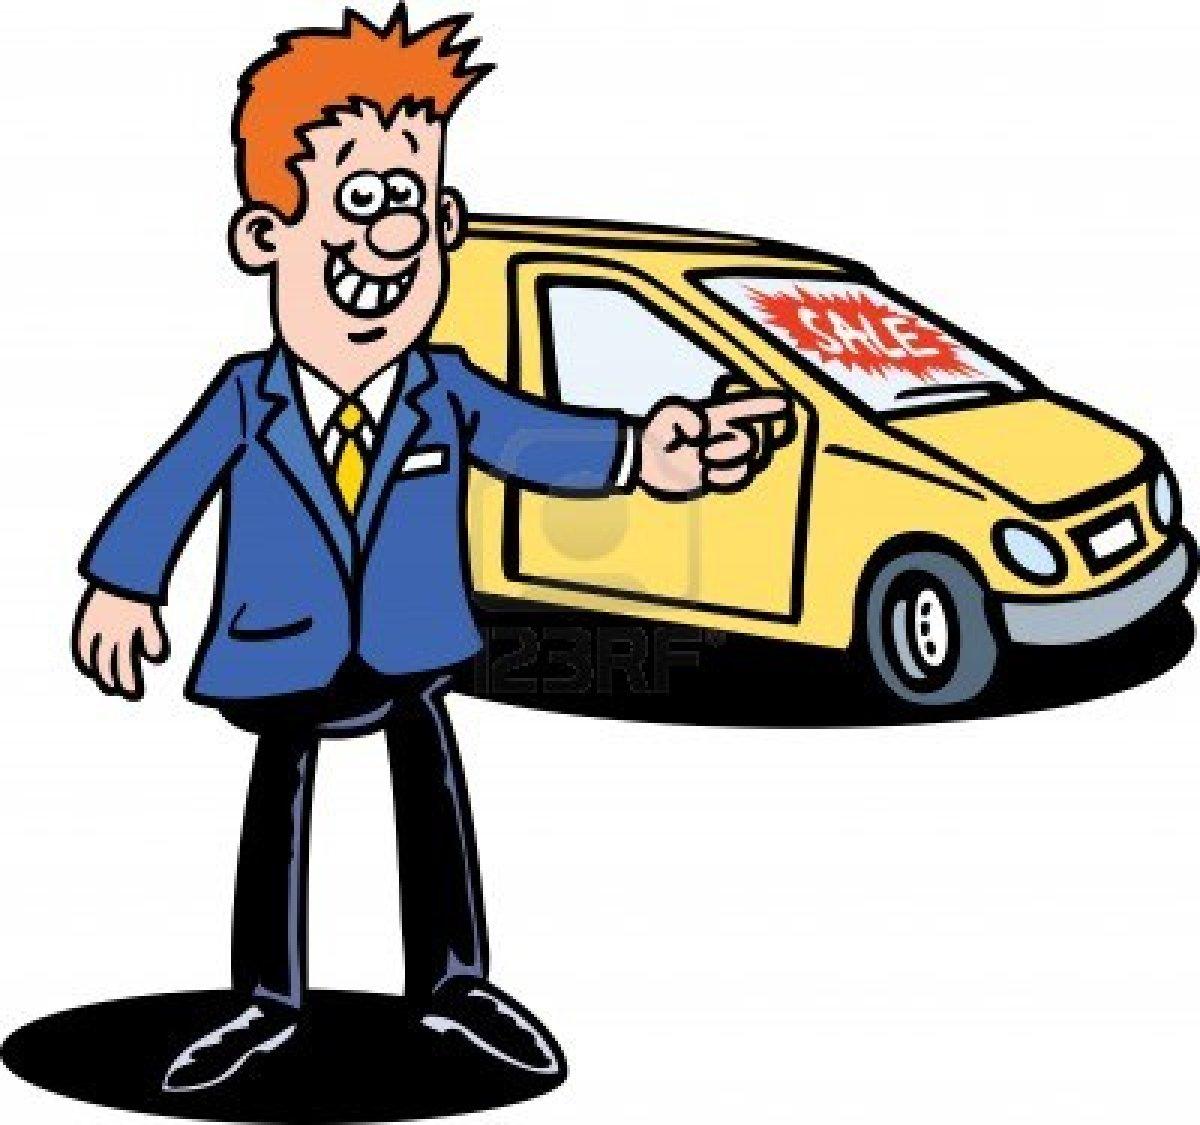 Salesman cliparts-Salesman cliparts-2